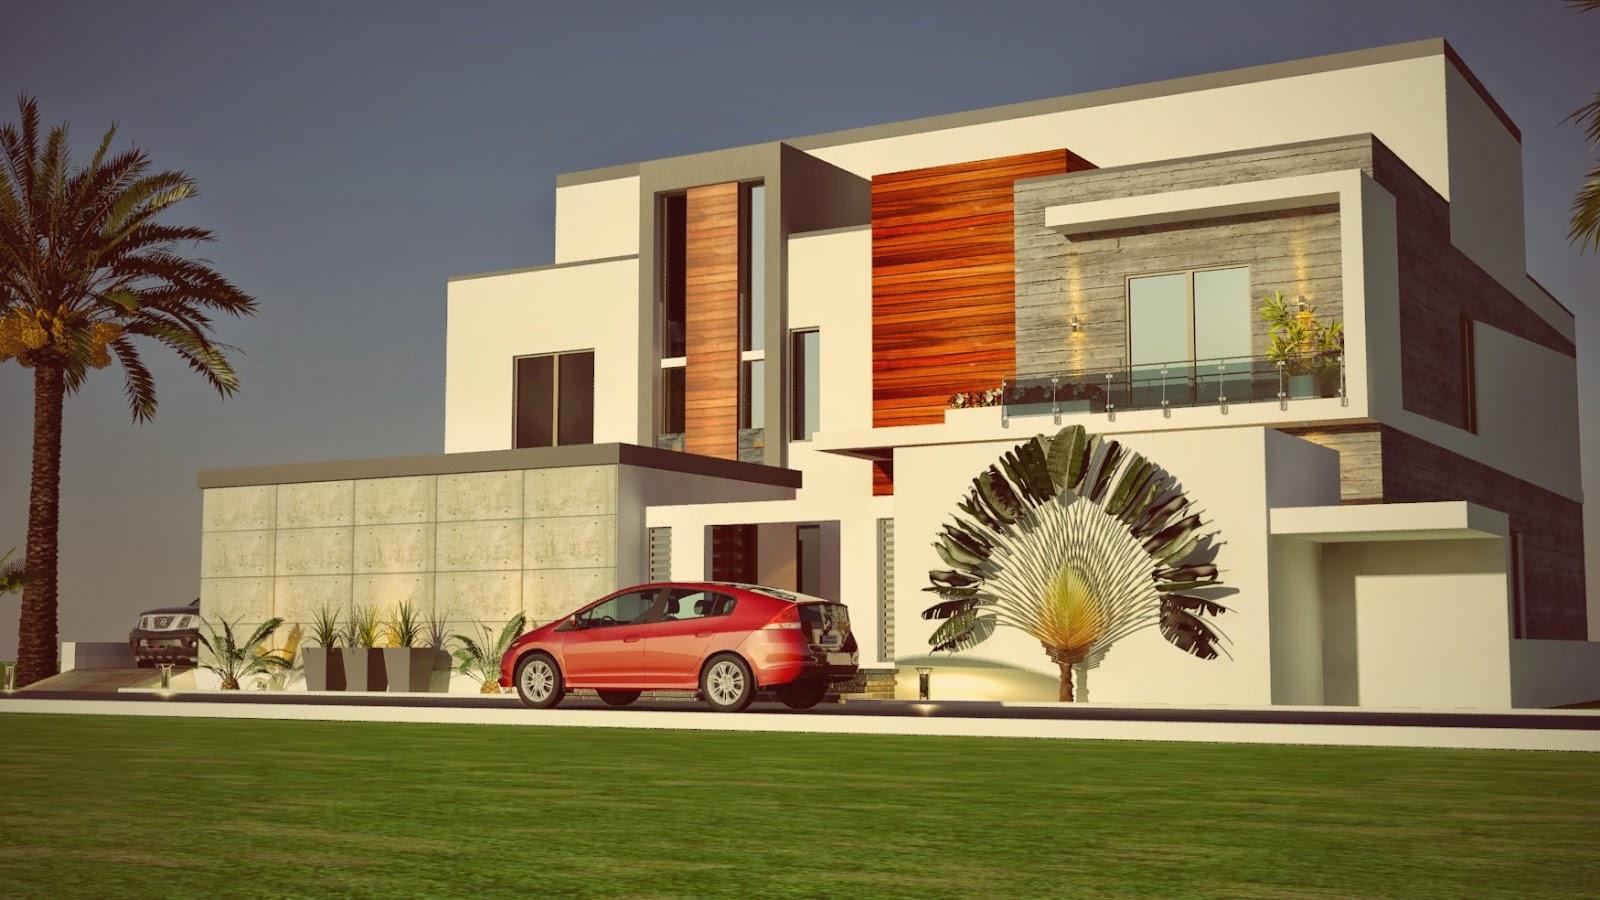 Dubai Arabian Modern Contemporary Beautiful House Design 3D Front ...